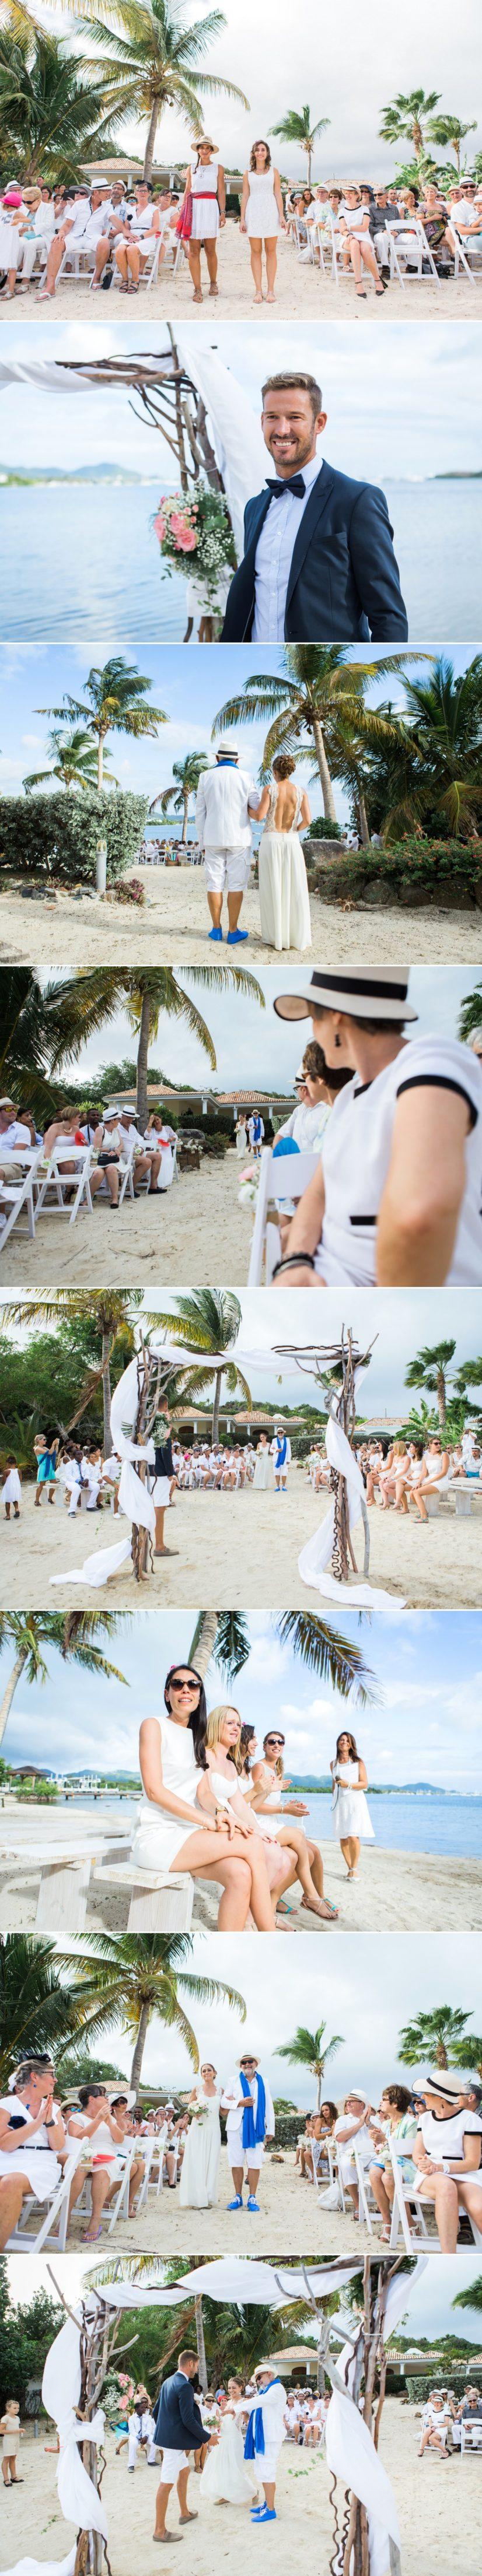 cérémonie mariage plage caraïbes